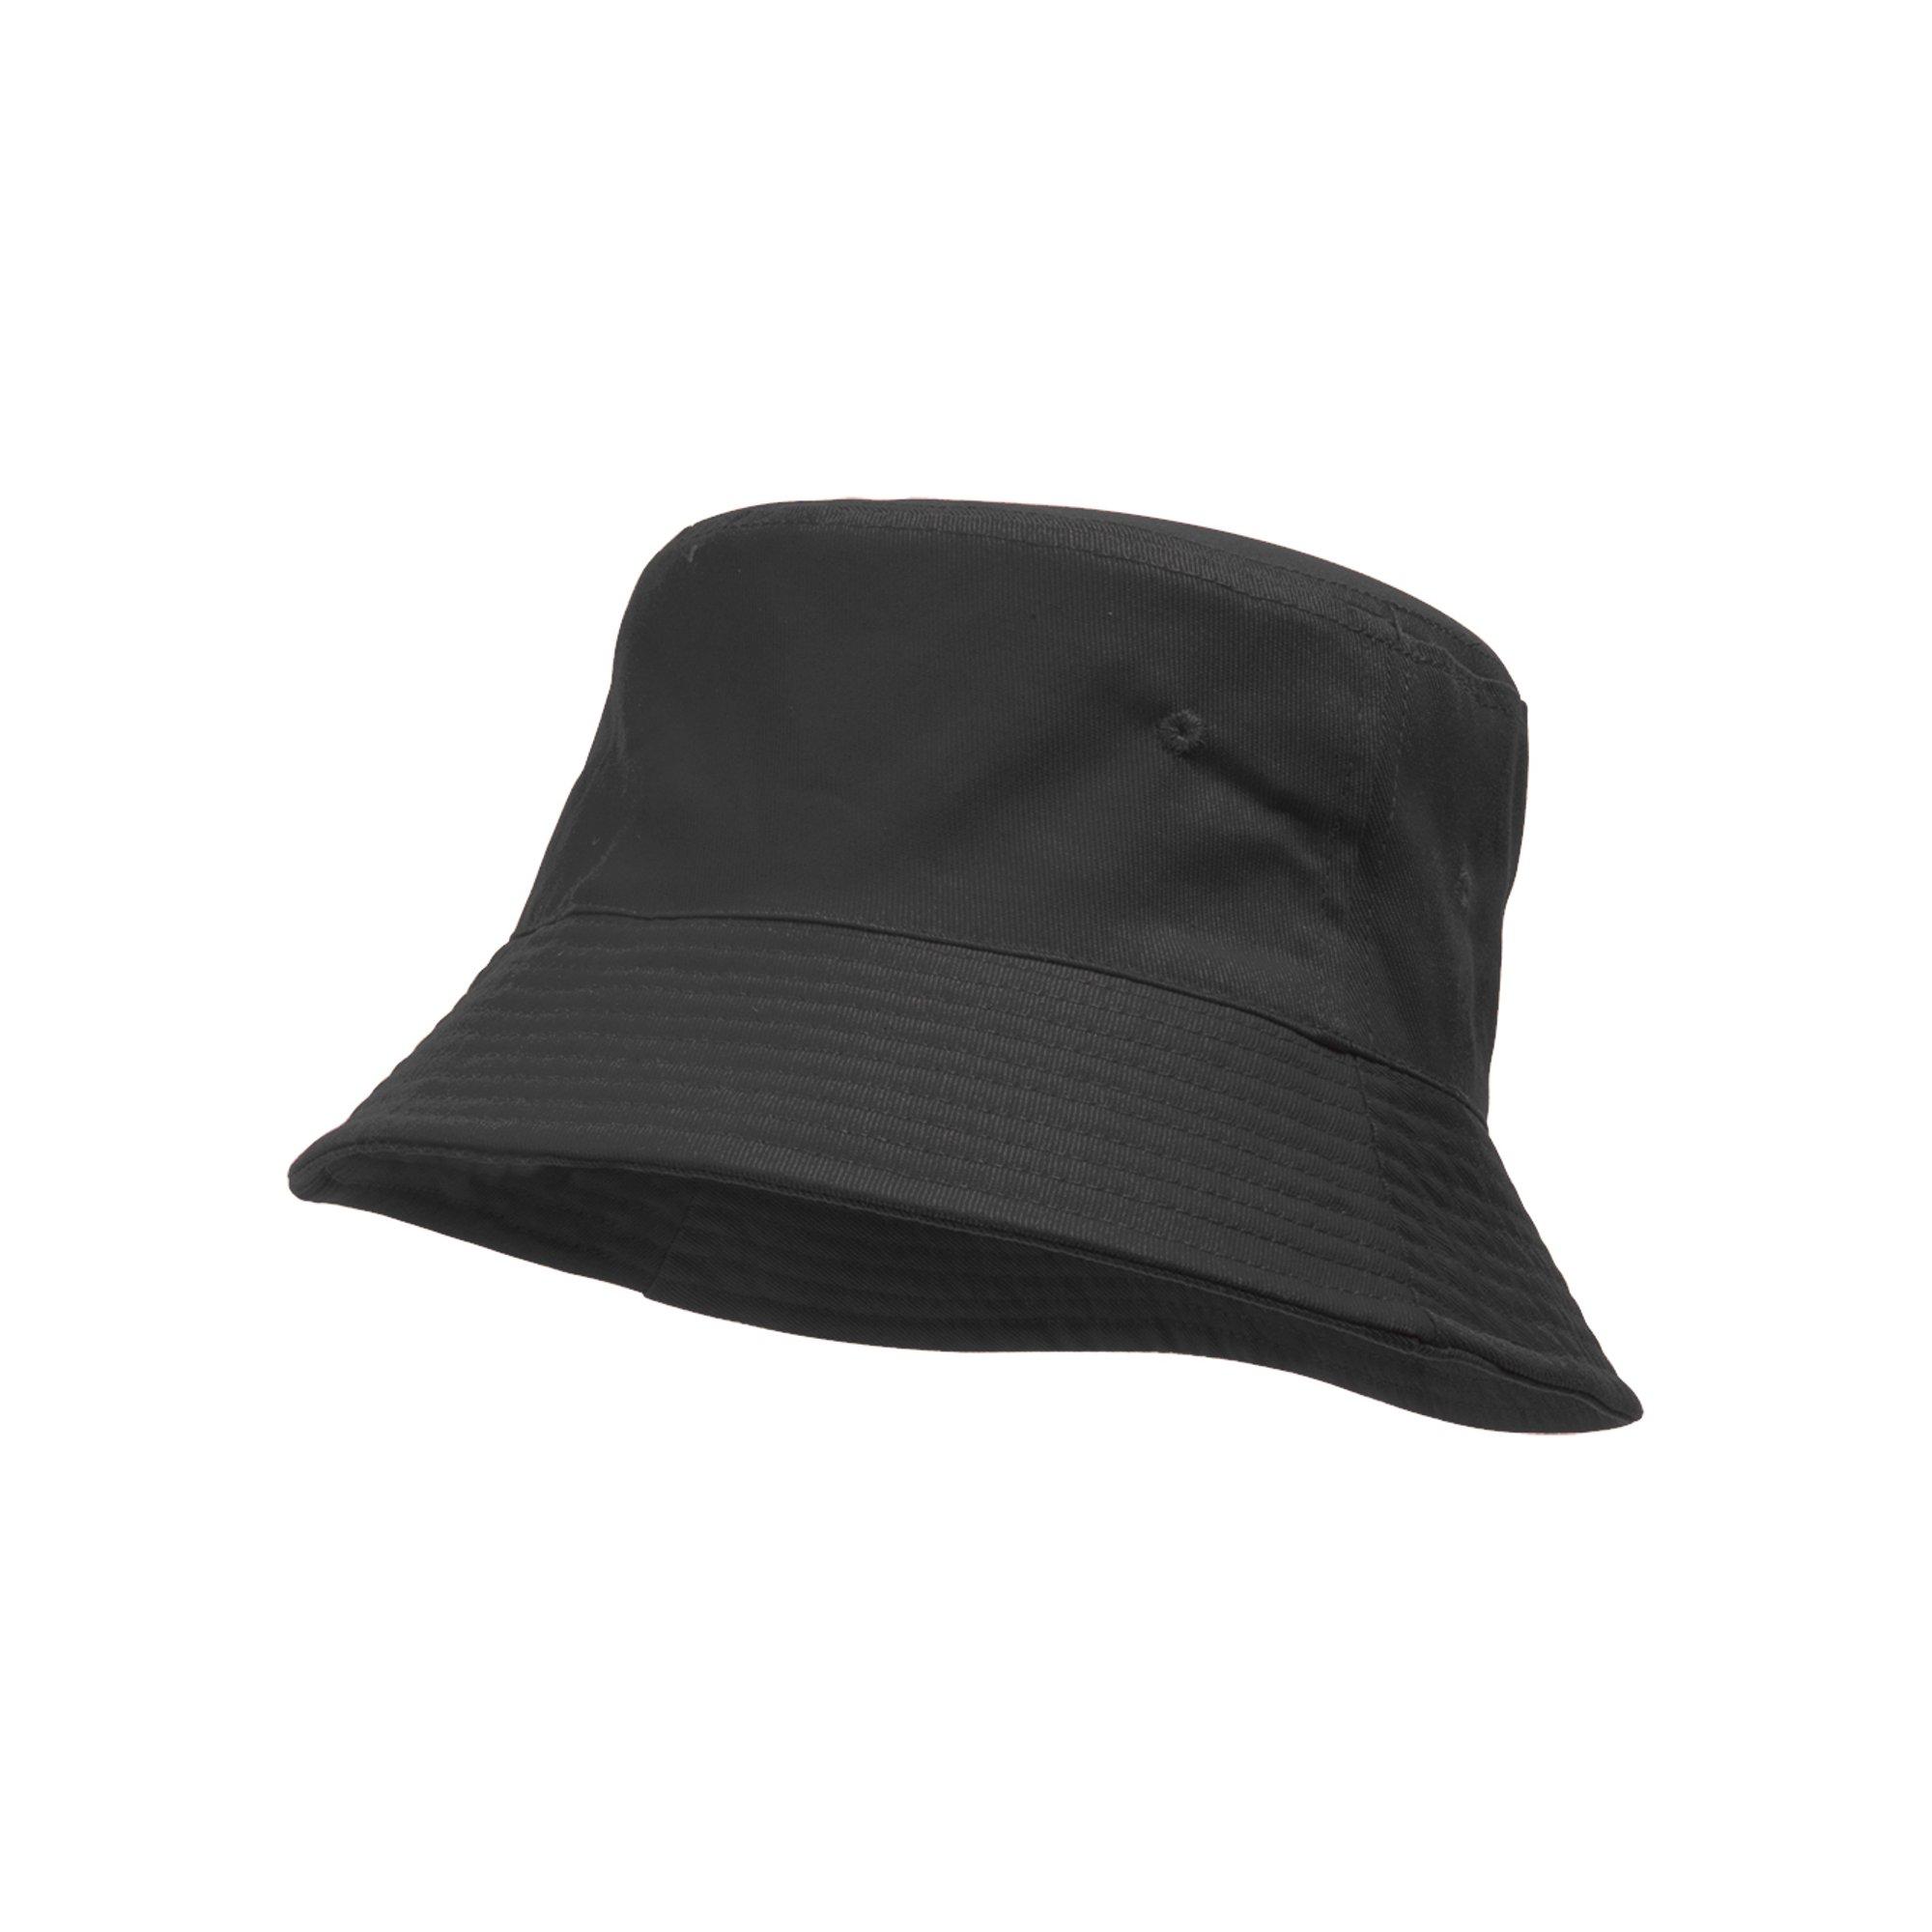 d560942e1 TopHeadwear Blank Cotton Bucket Hat - Dark Gray - Small/Medium